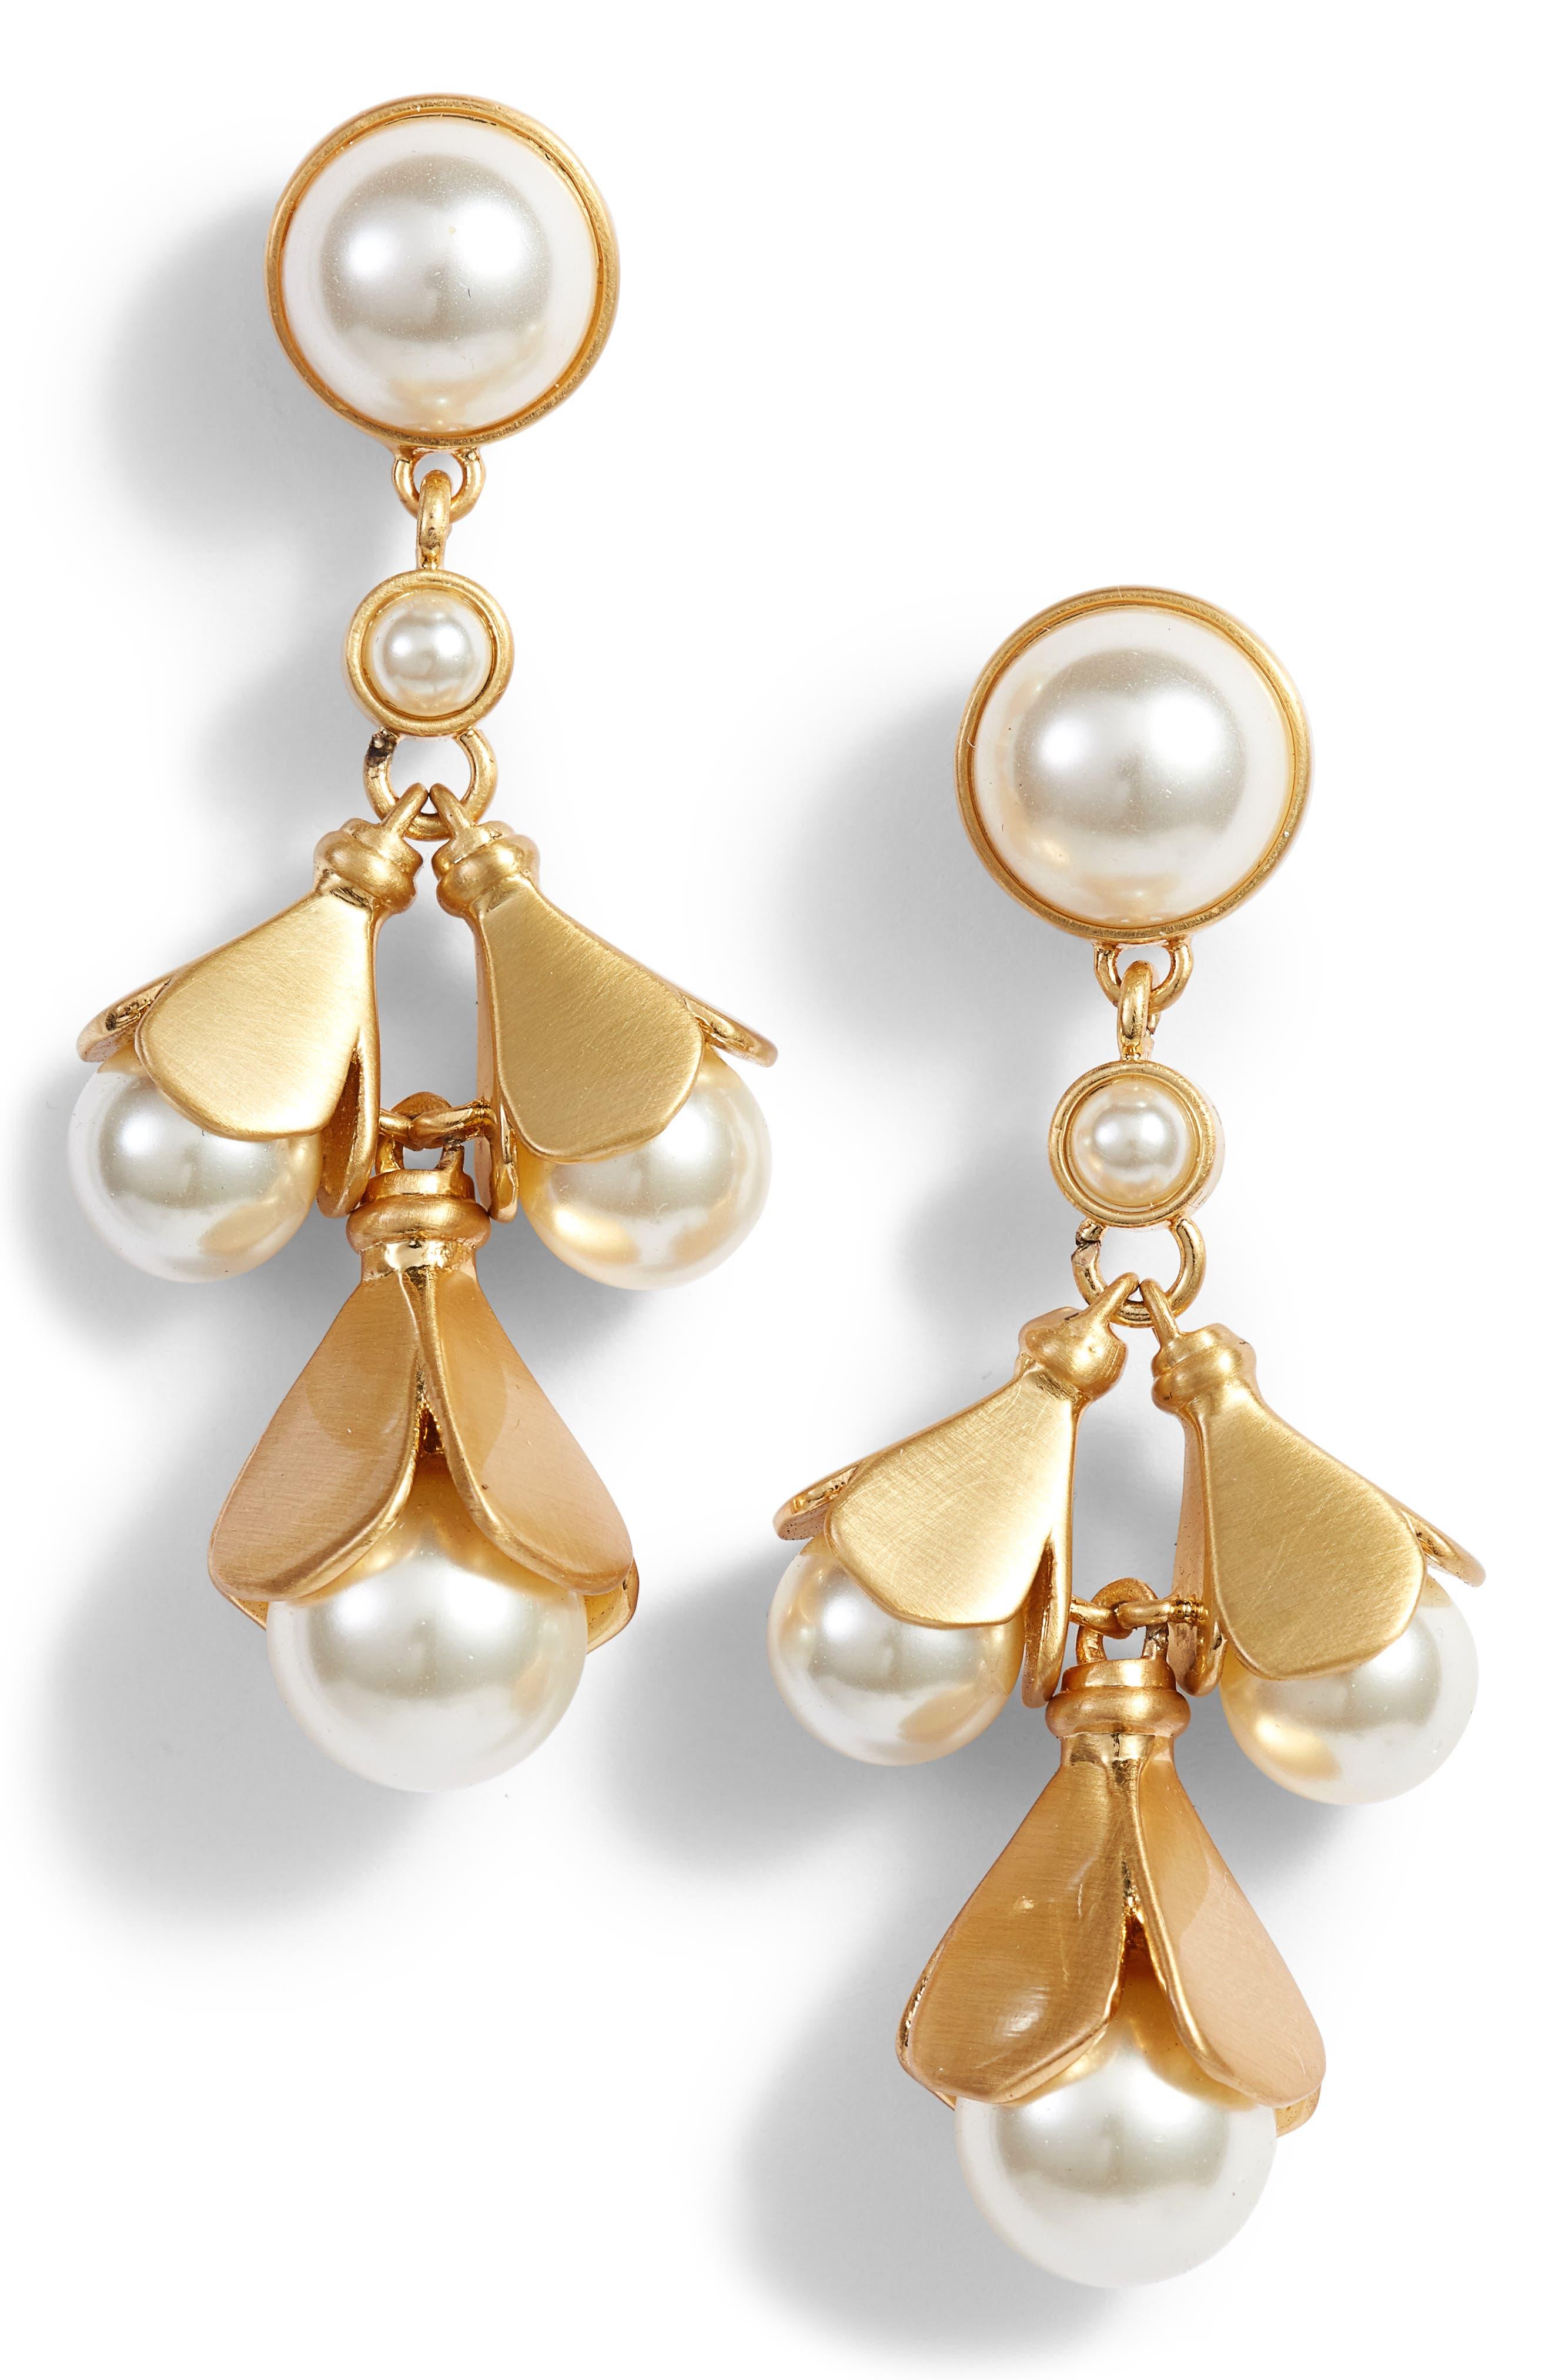 Bellflower Drop Earrings,                             Main thumbnail 1, color,                             PEARL / BRASS